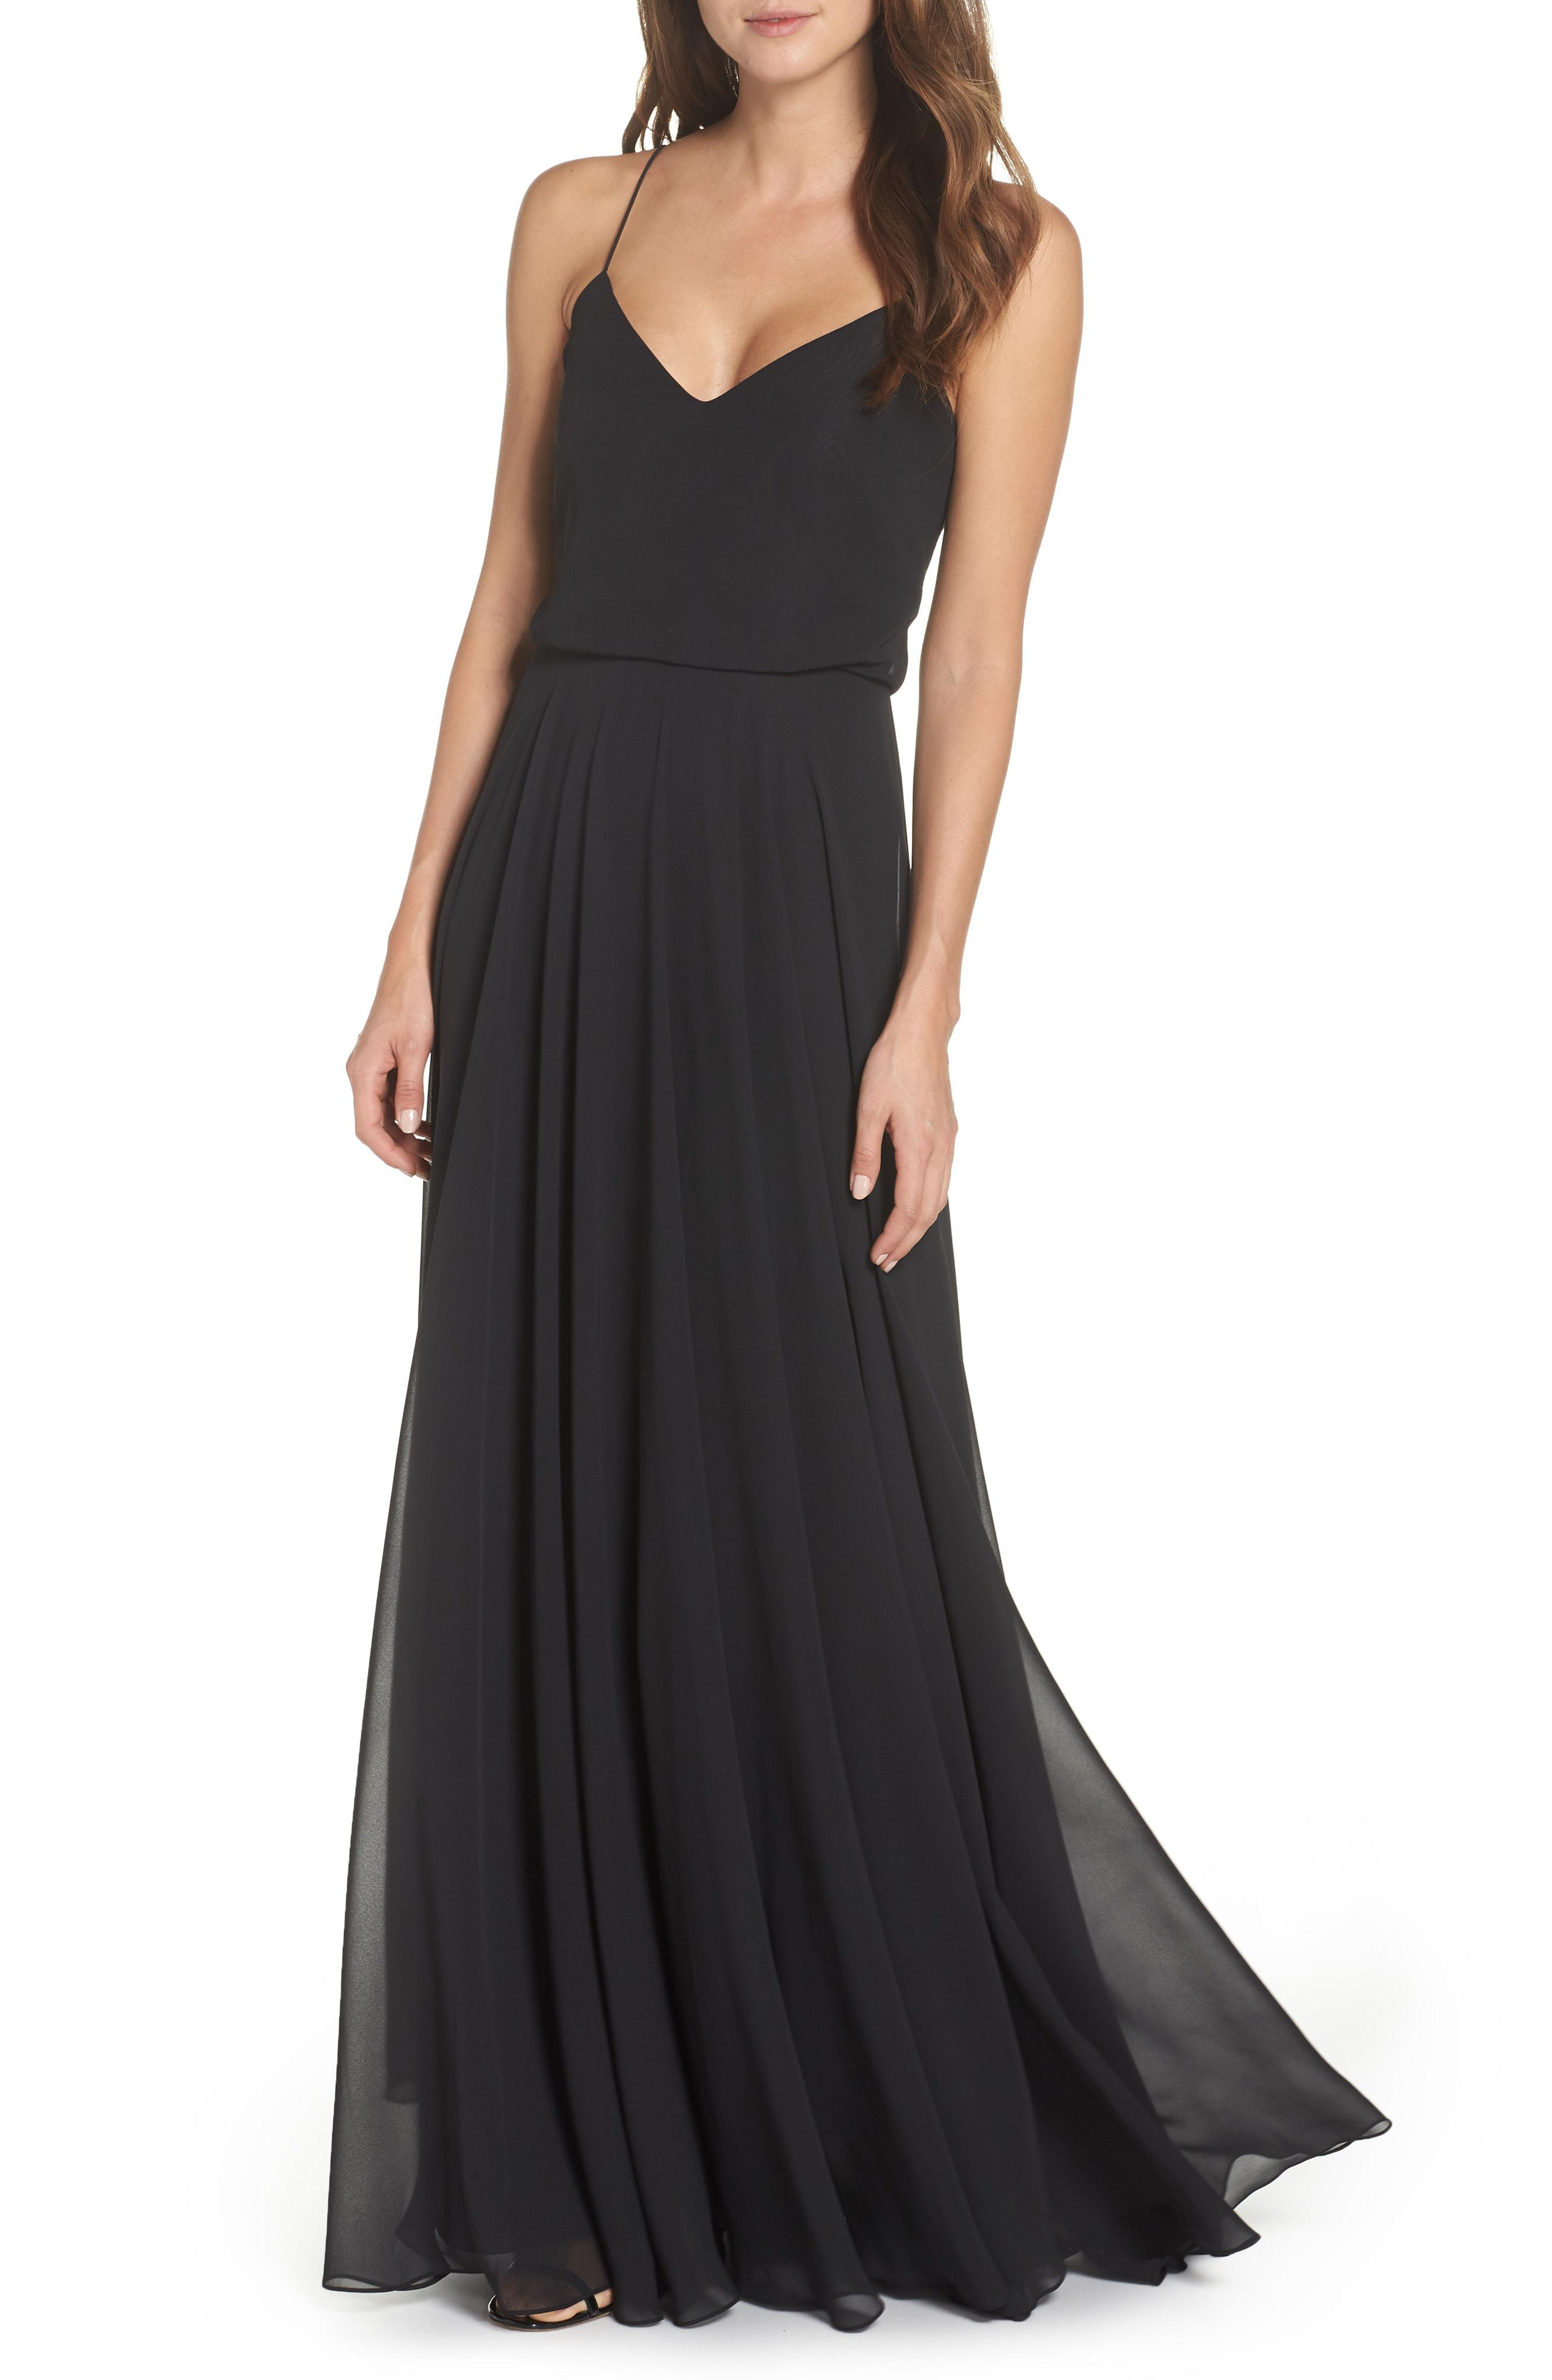 4edfa4132800 Lyst - Jenny Yoo 'inesse' Chiffon V-neck Spaghetti Strap Gown in Black